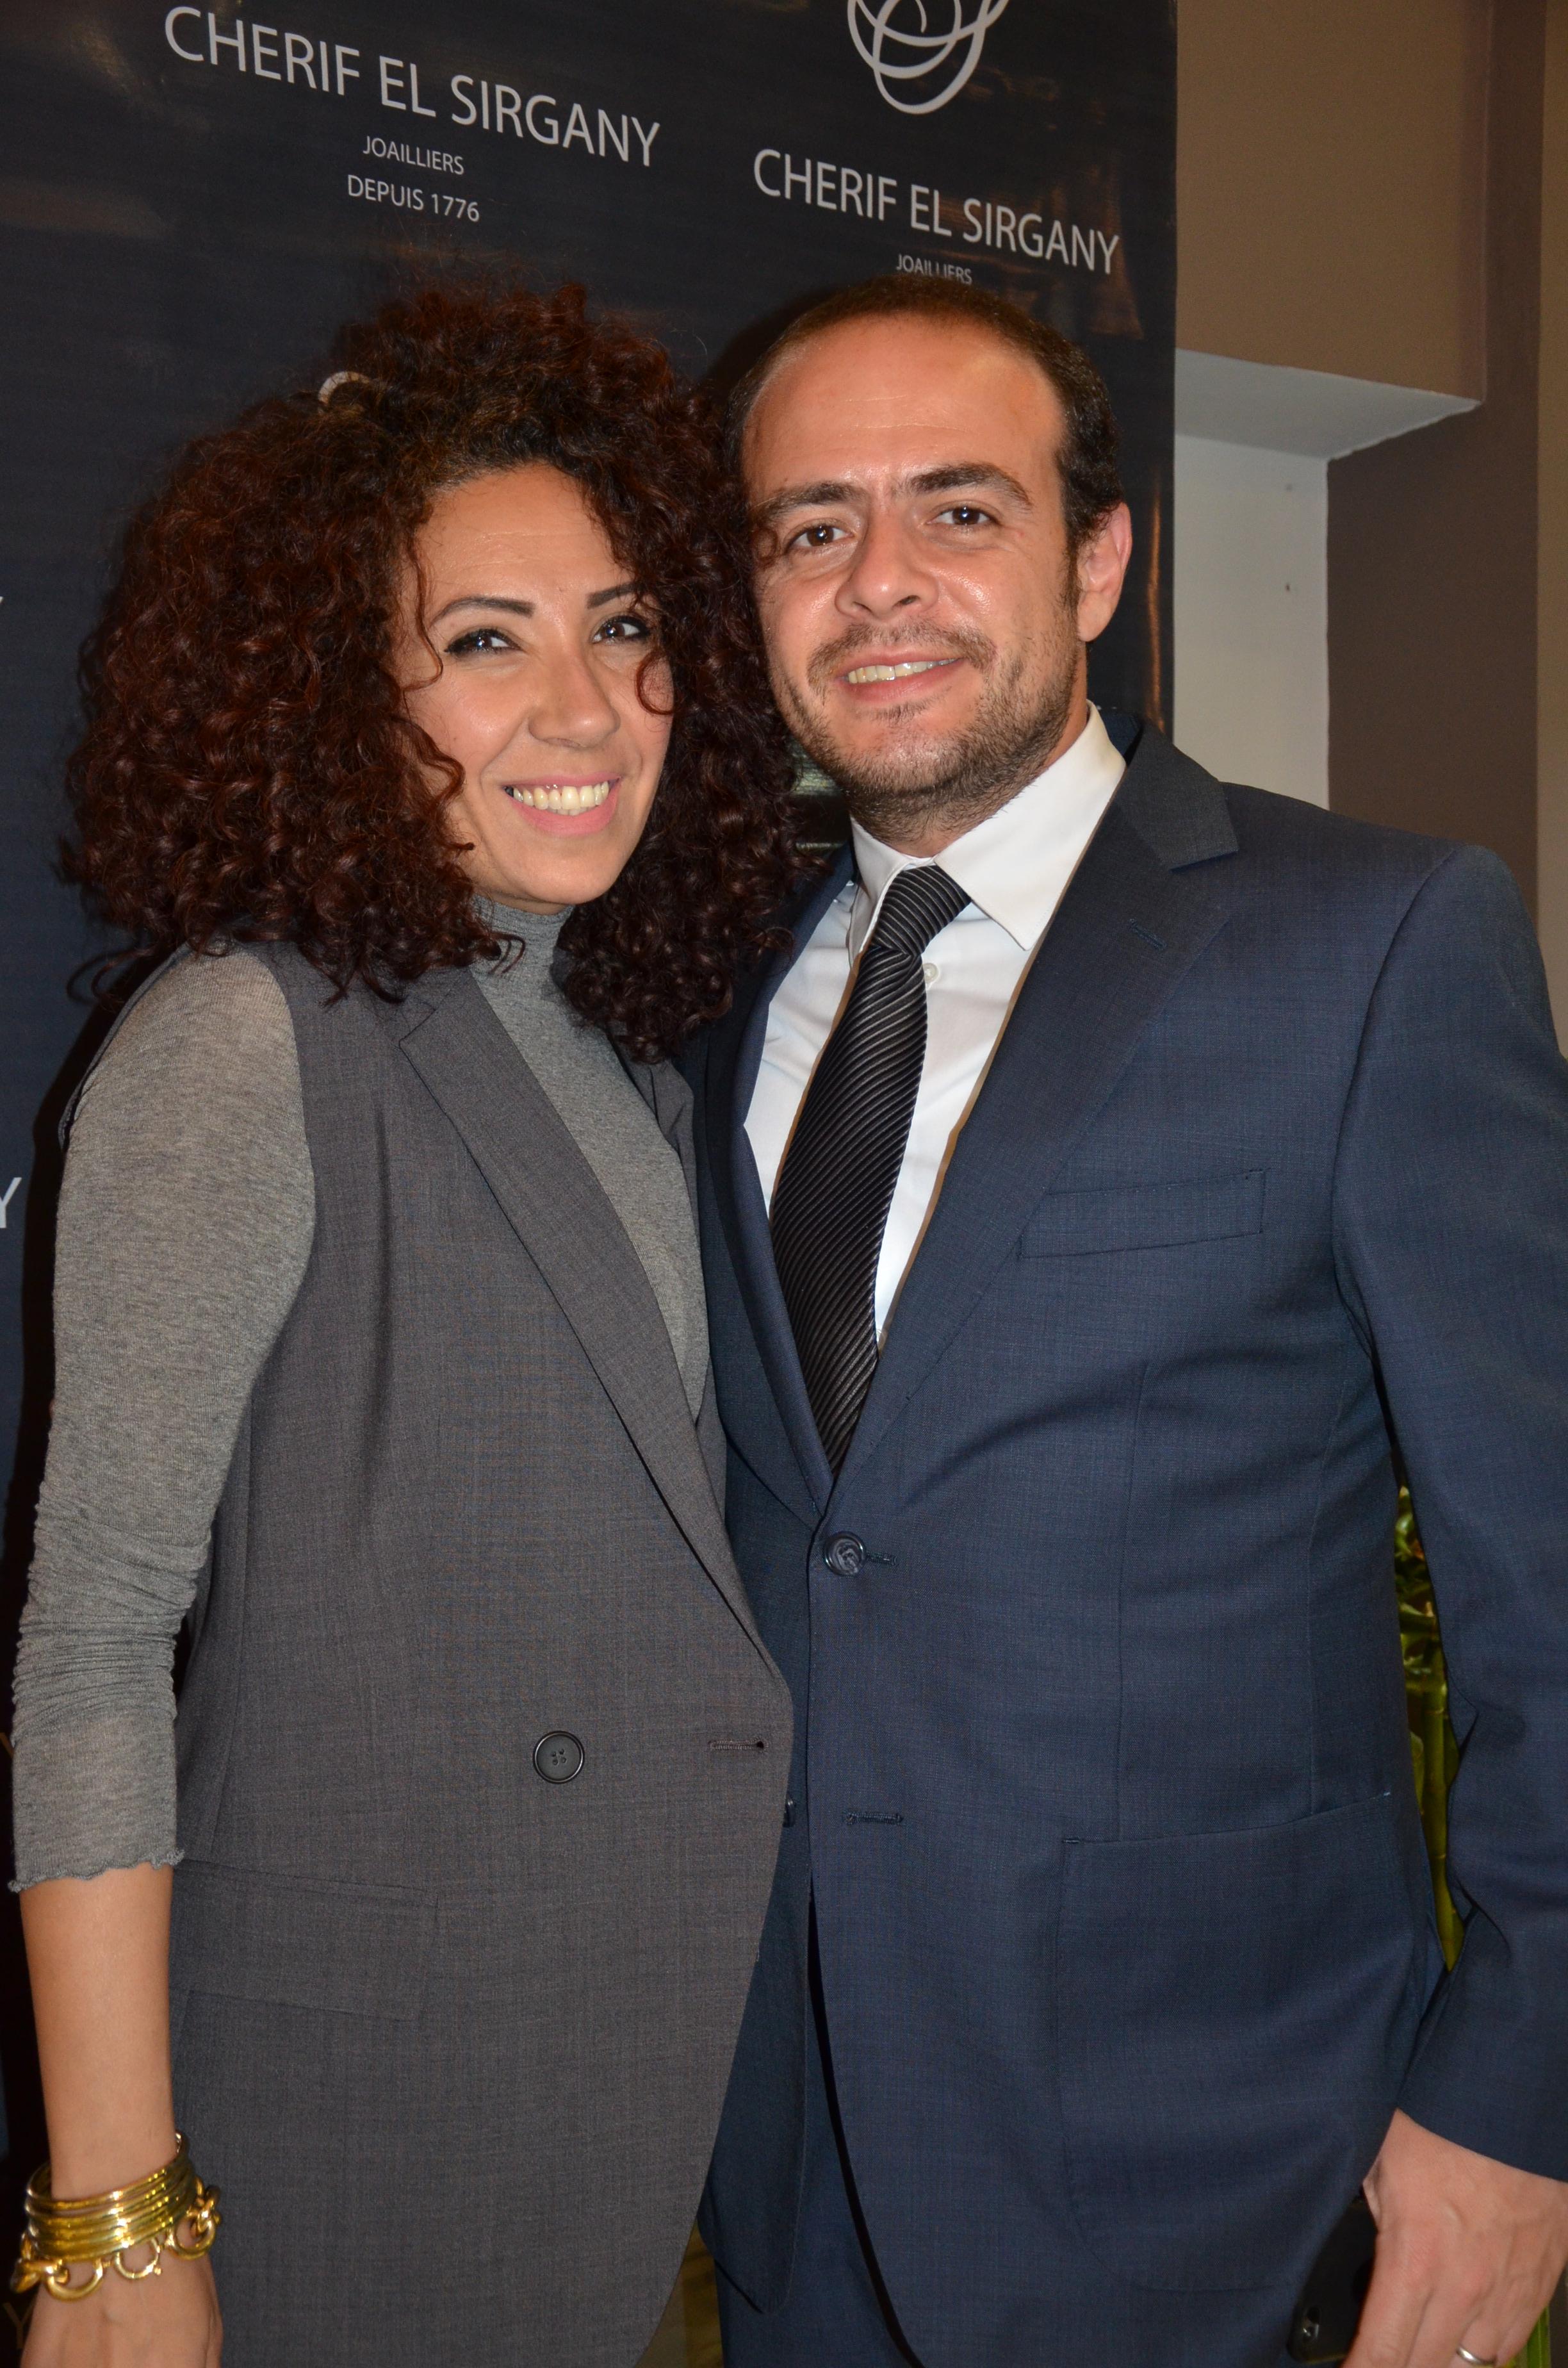 Mr. Mahmoud El Sirgany & Ms. Marwa El Sirgany